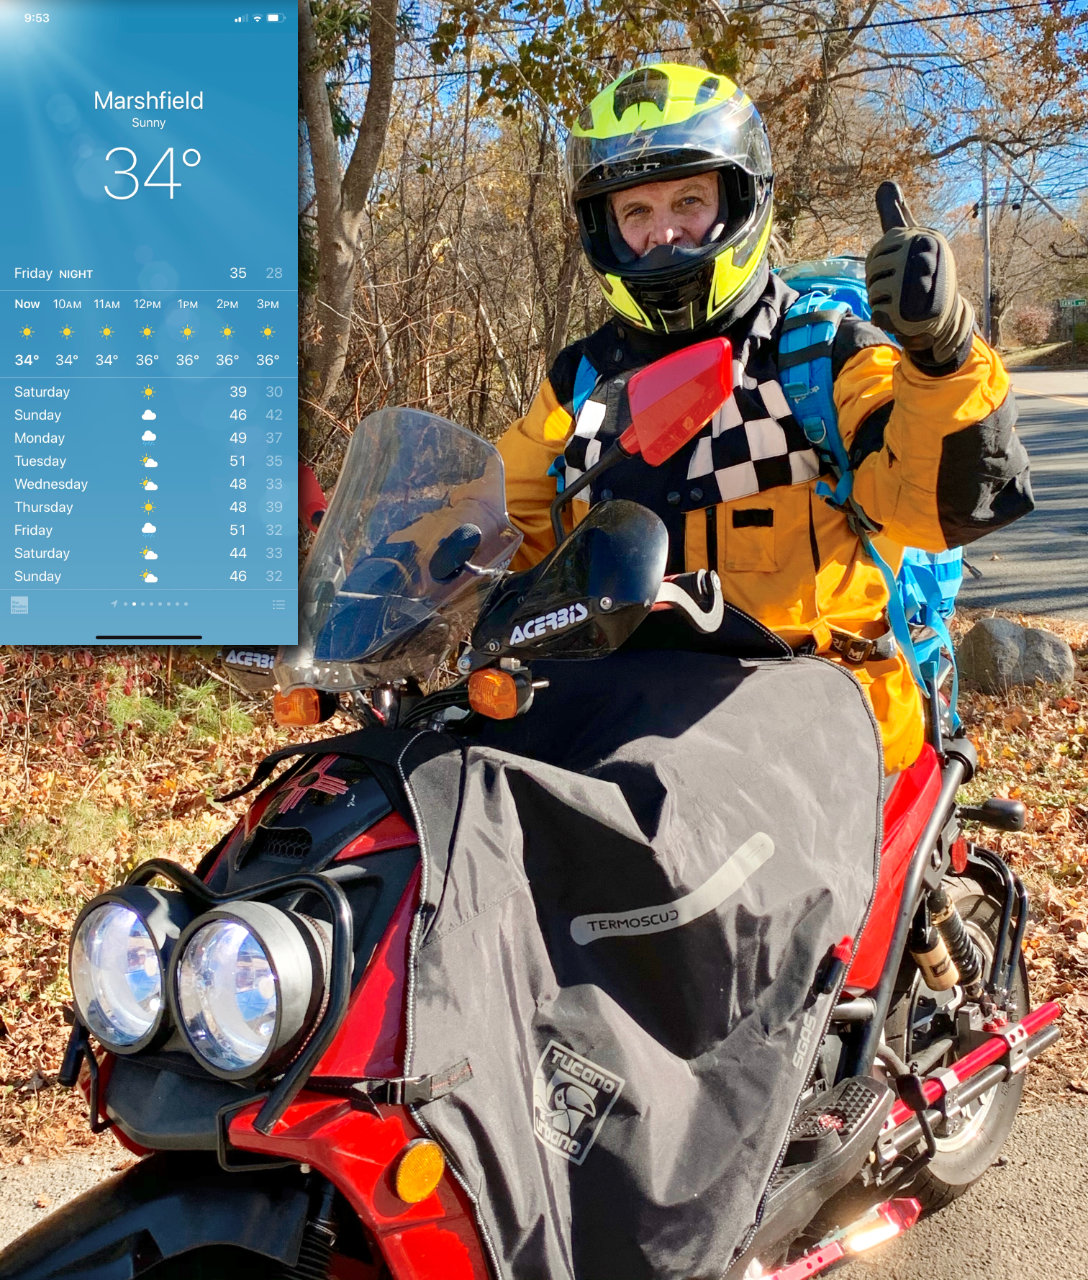 MJS scooter winter IMG_9780.1280.jpg